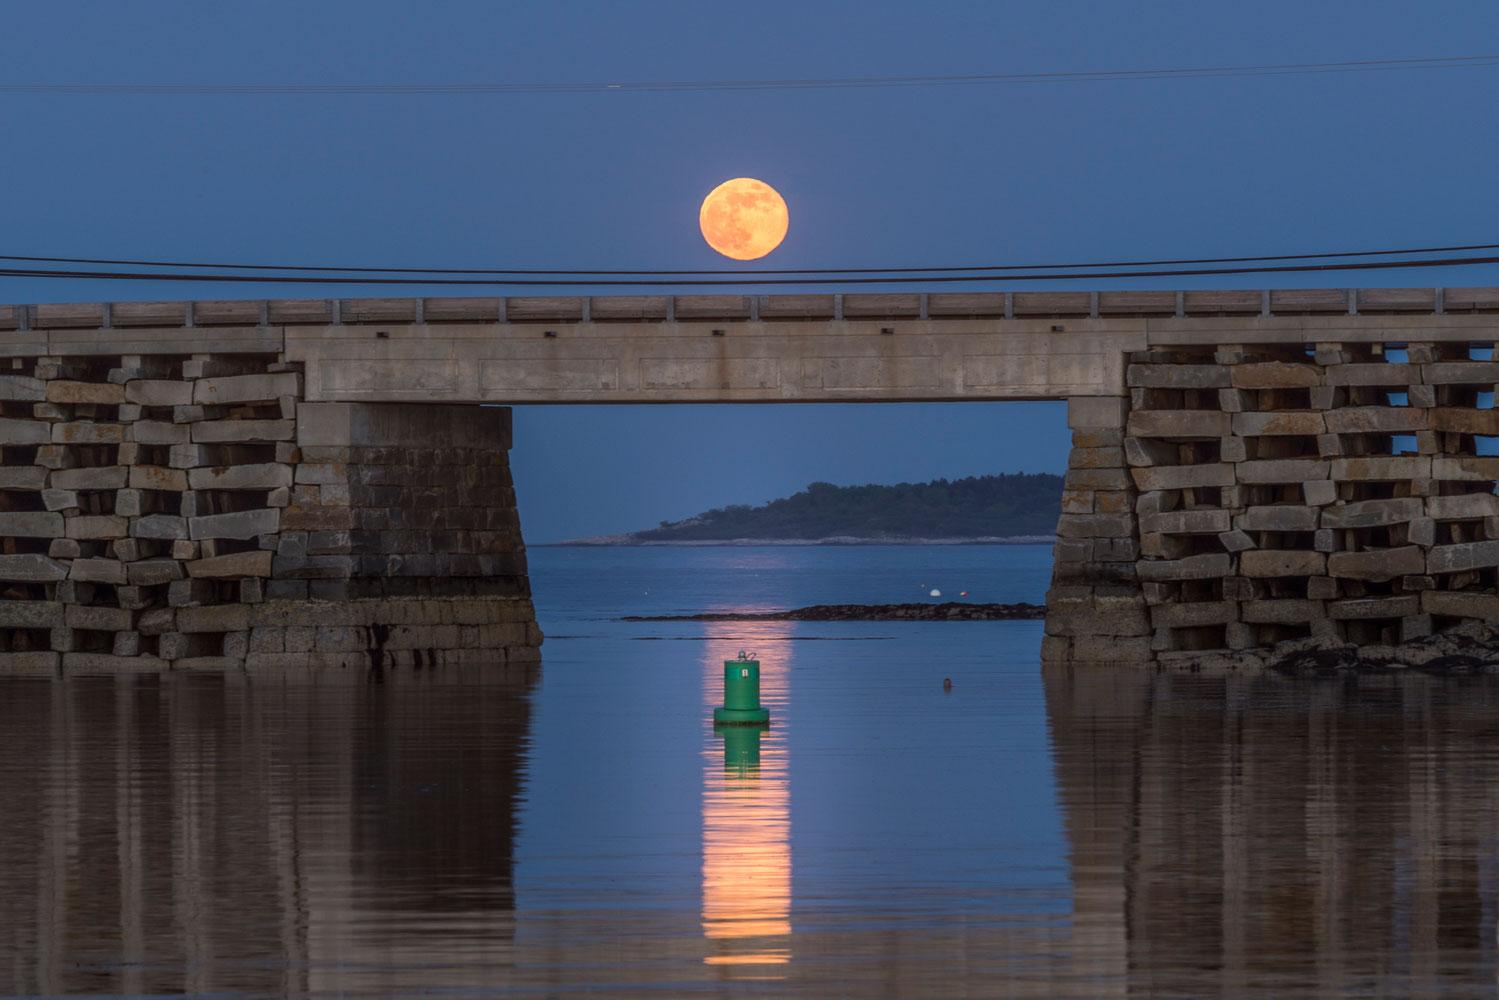 Cribstone Bridge – Craig Shaknis